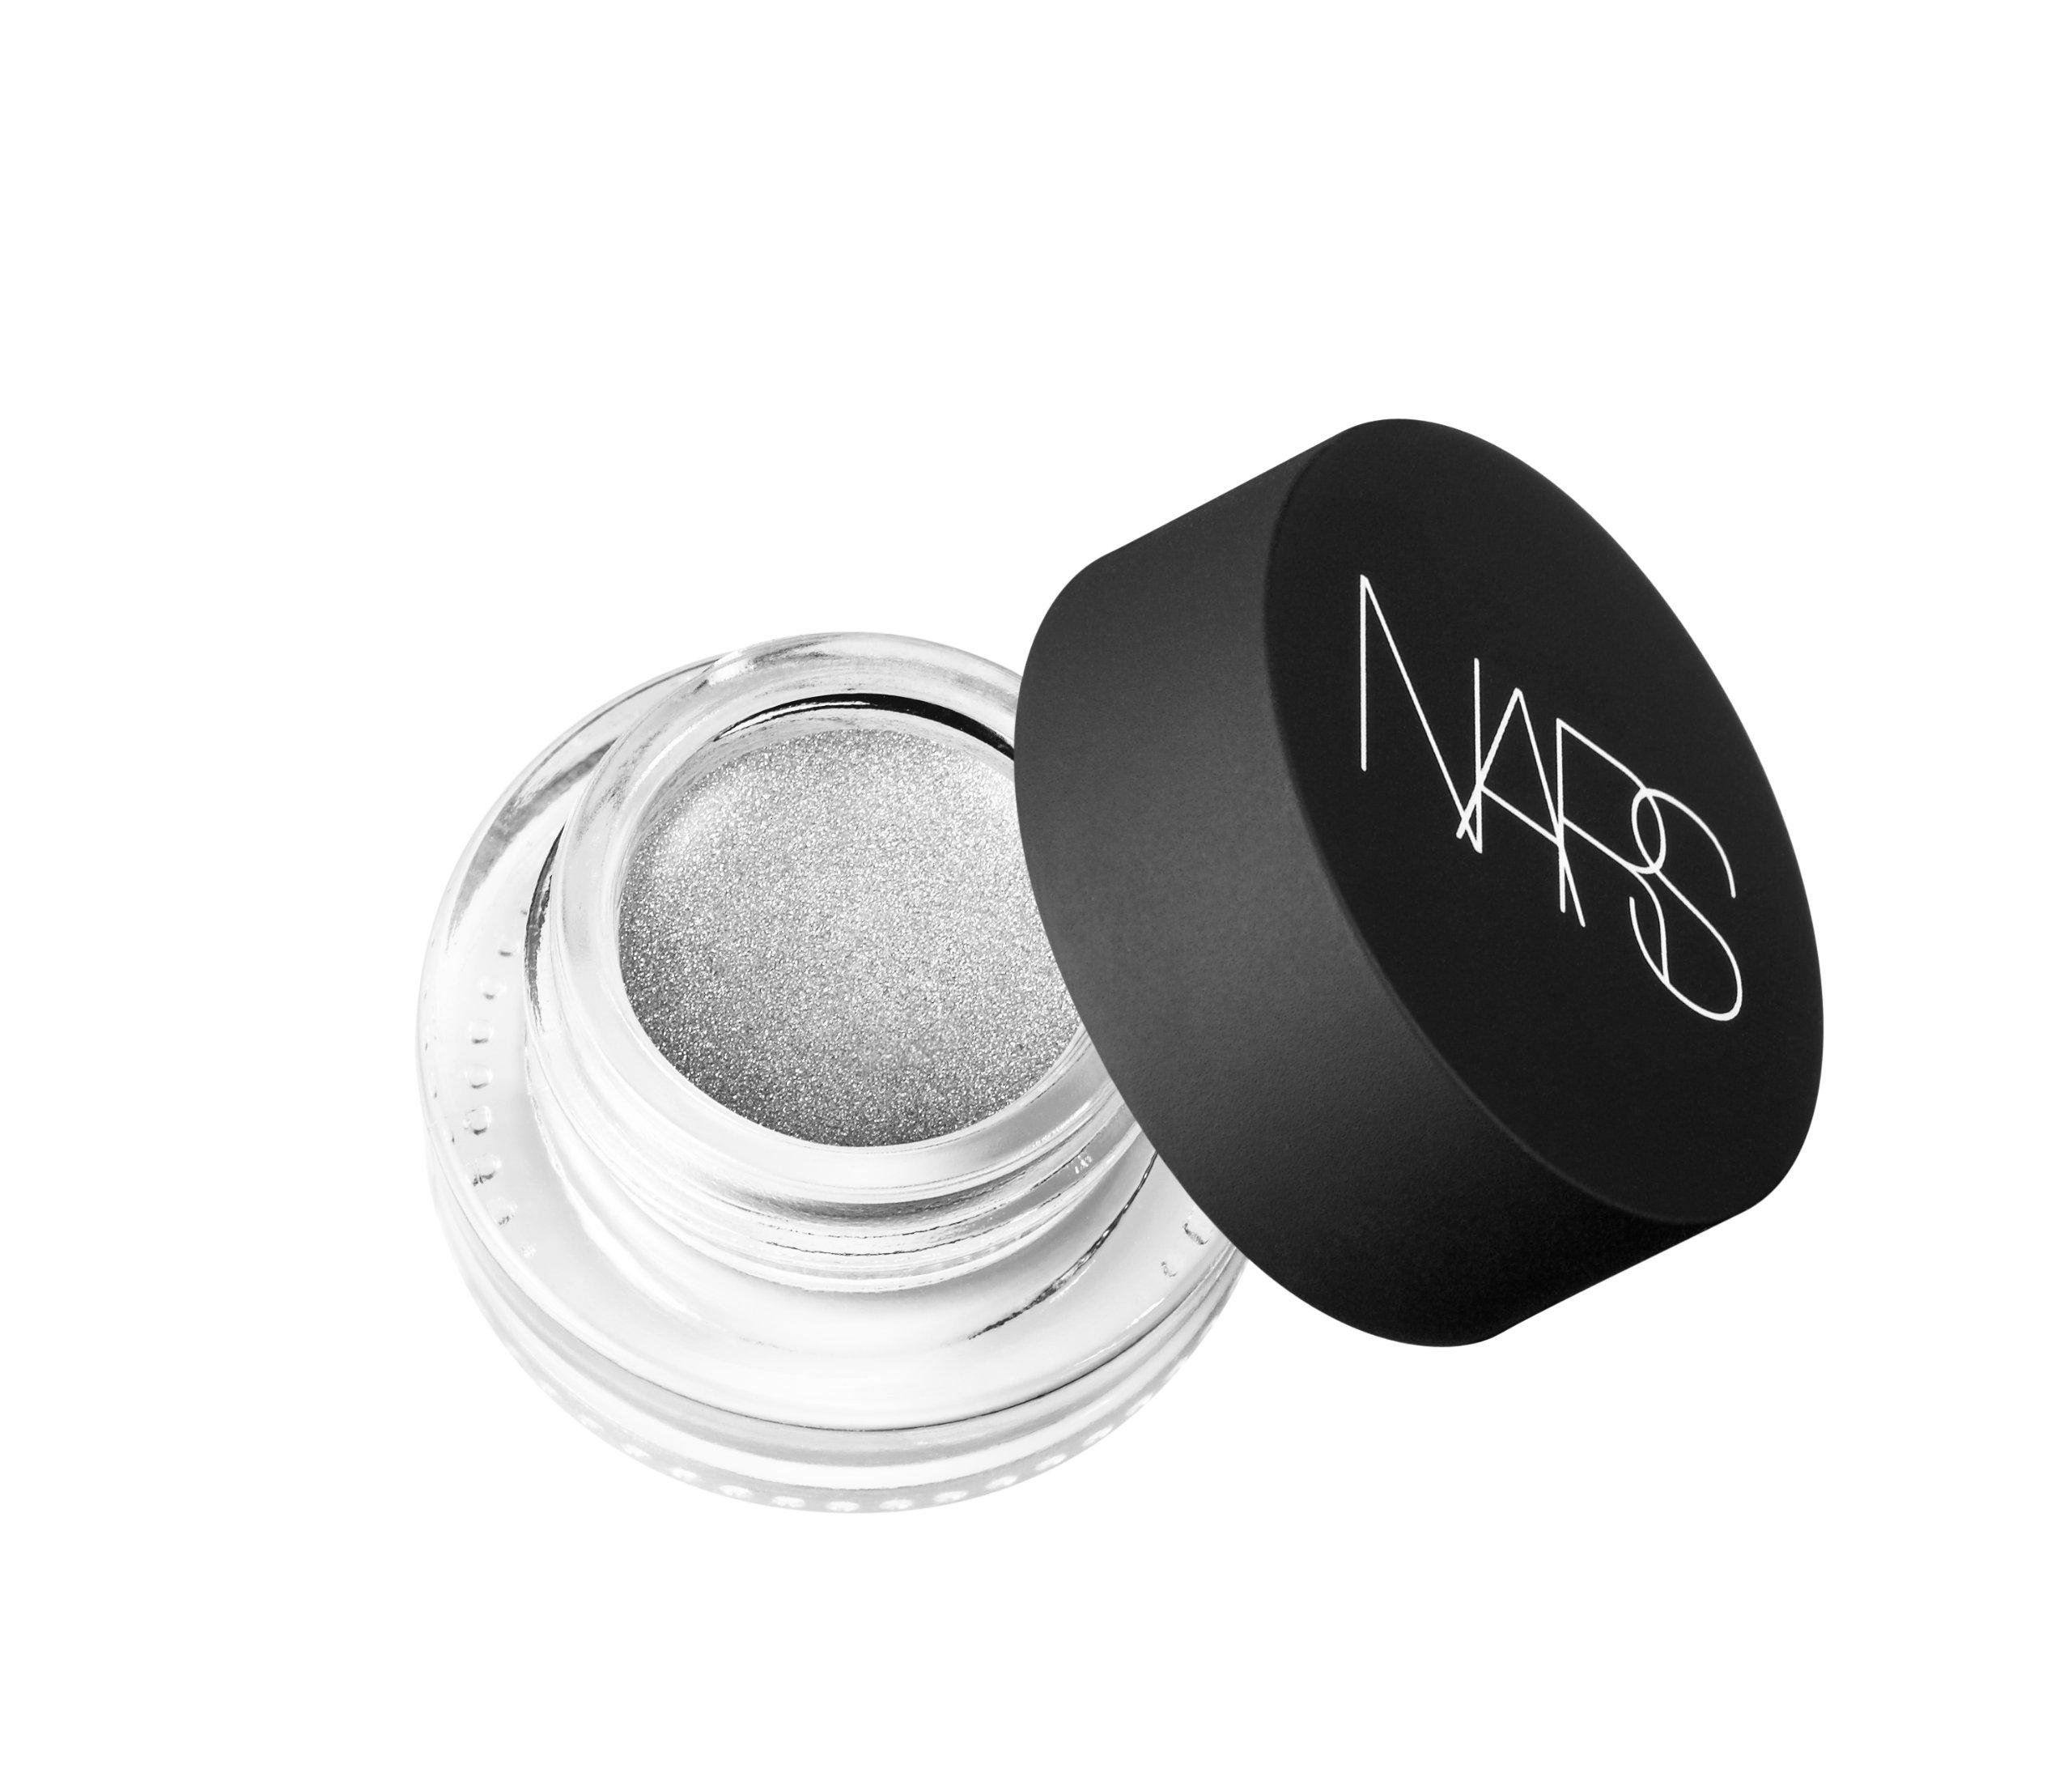 NARS Eye Paint, Interstellar